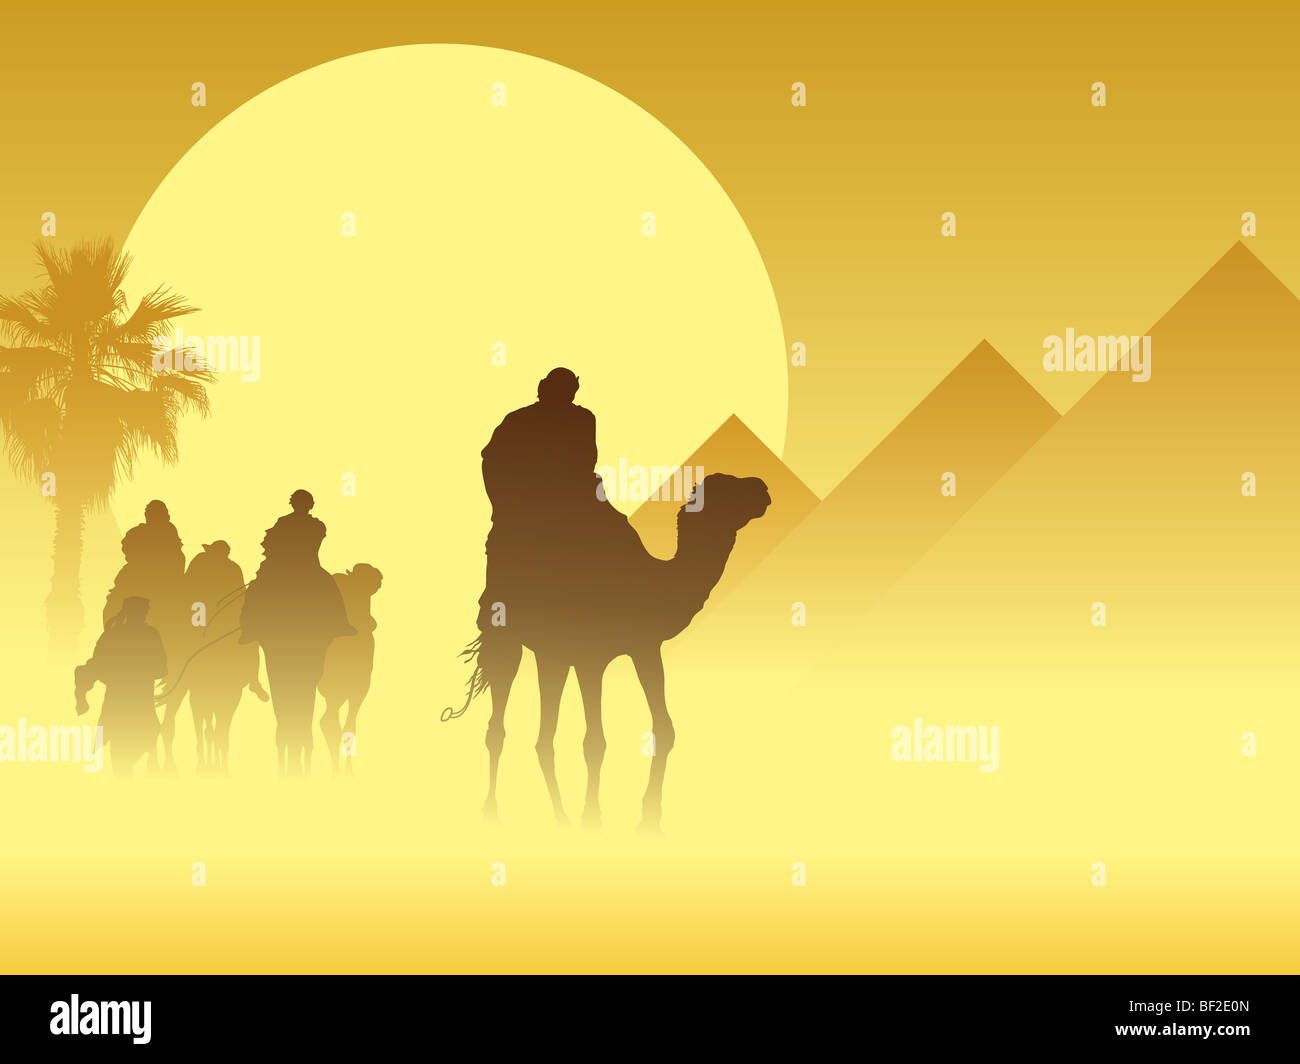 Camel caravan going through the sandstorm near pyramids - Stock Image